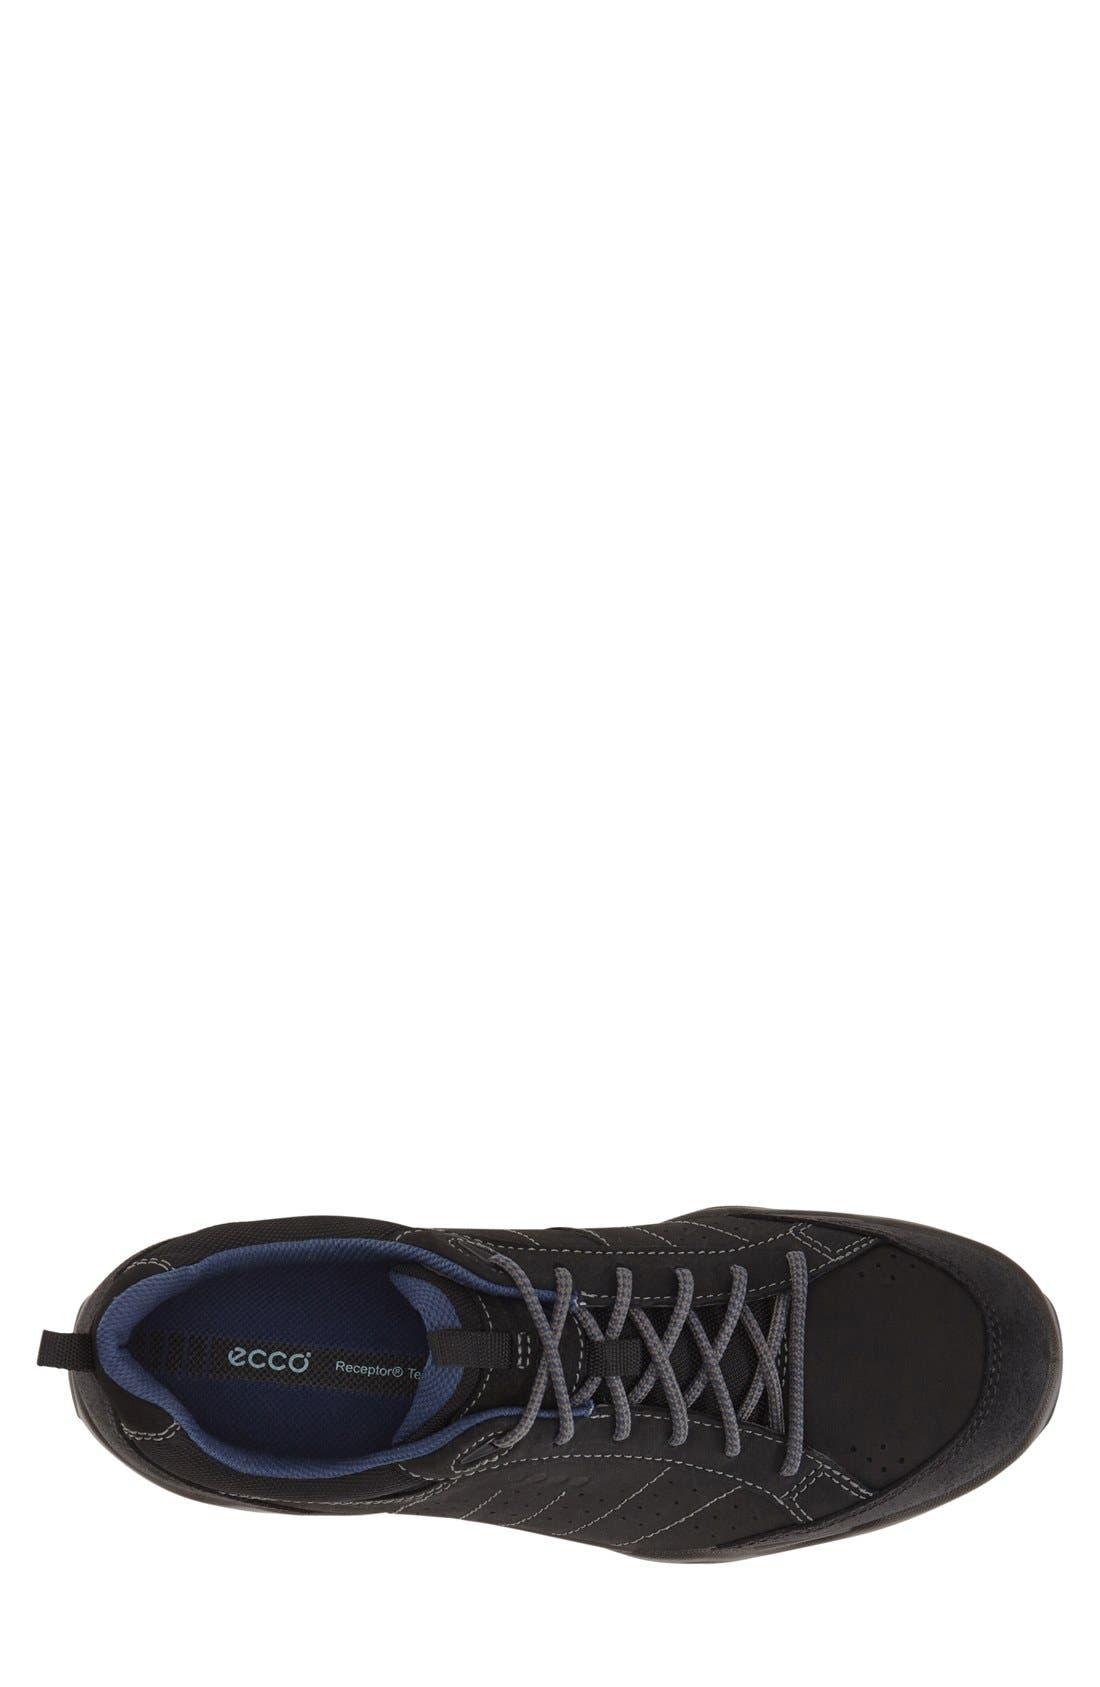 'Sierra II' Sneaker,                             Alternate thumbnail 2, color,                             003